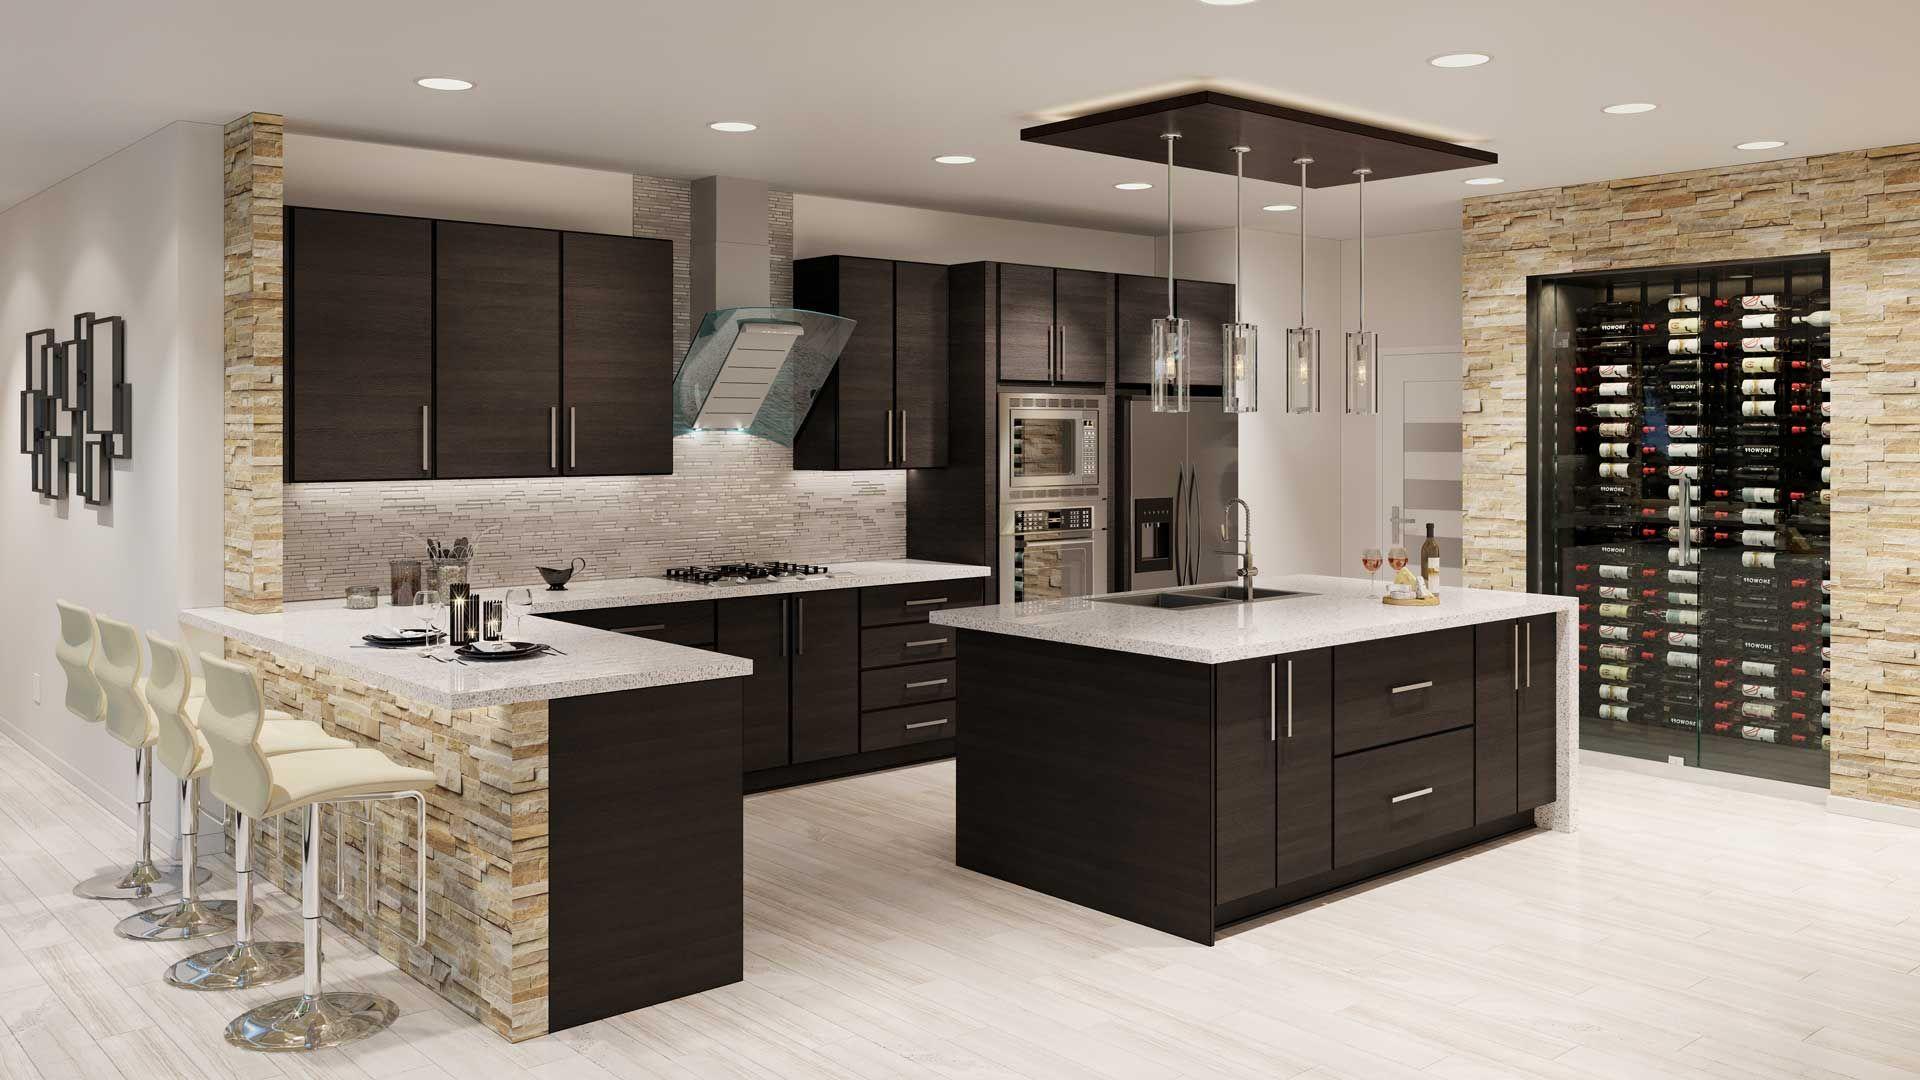 Premier Frameless Kitchen Cabinetexpress Us Kitchen Trends Kitchen Cabinet Trends Kitchen Cabinet Colors